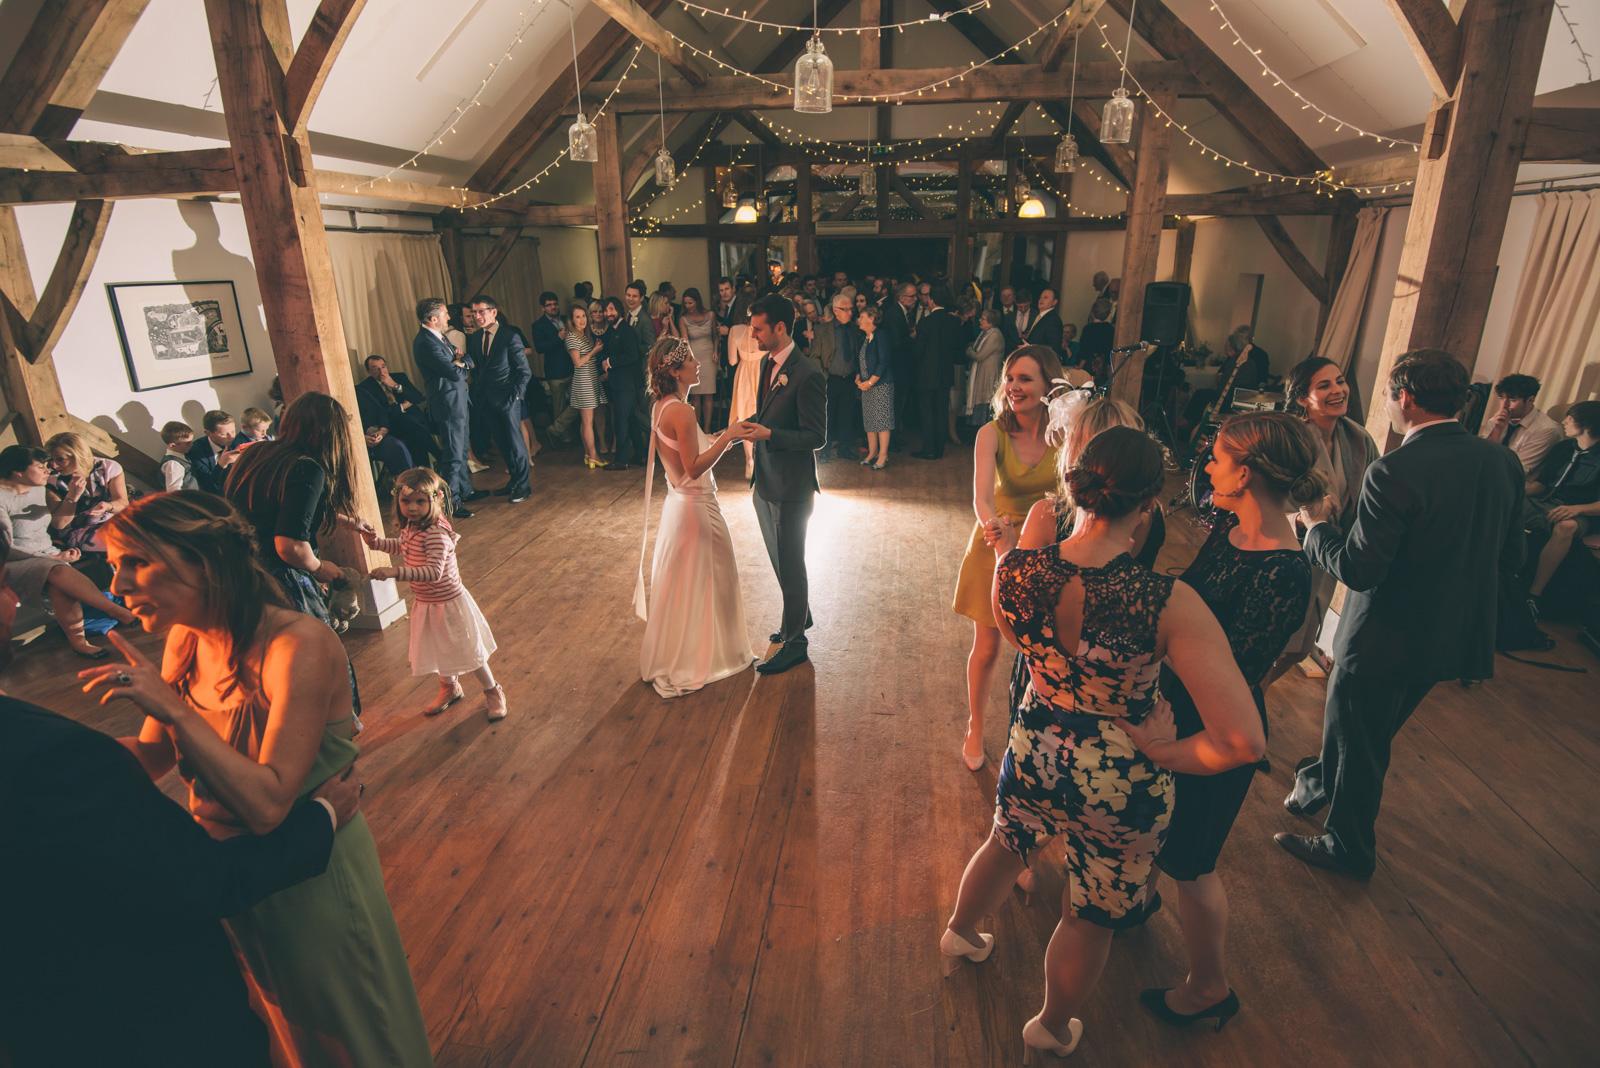 nancarrow-wedding-photography-171.jpg